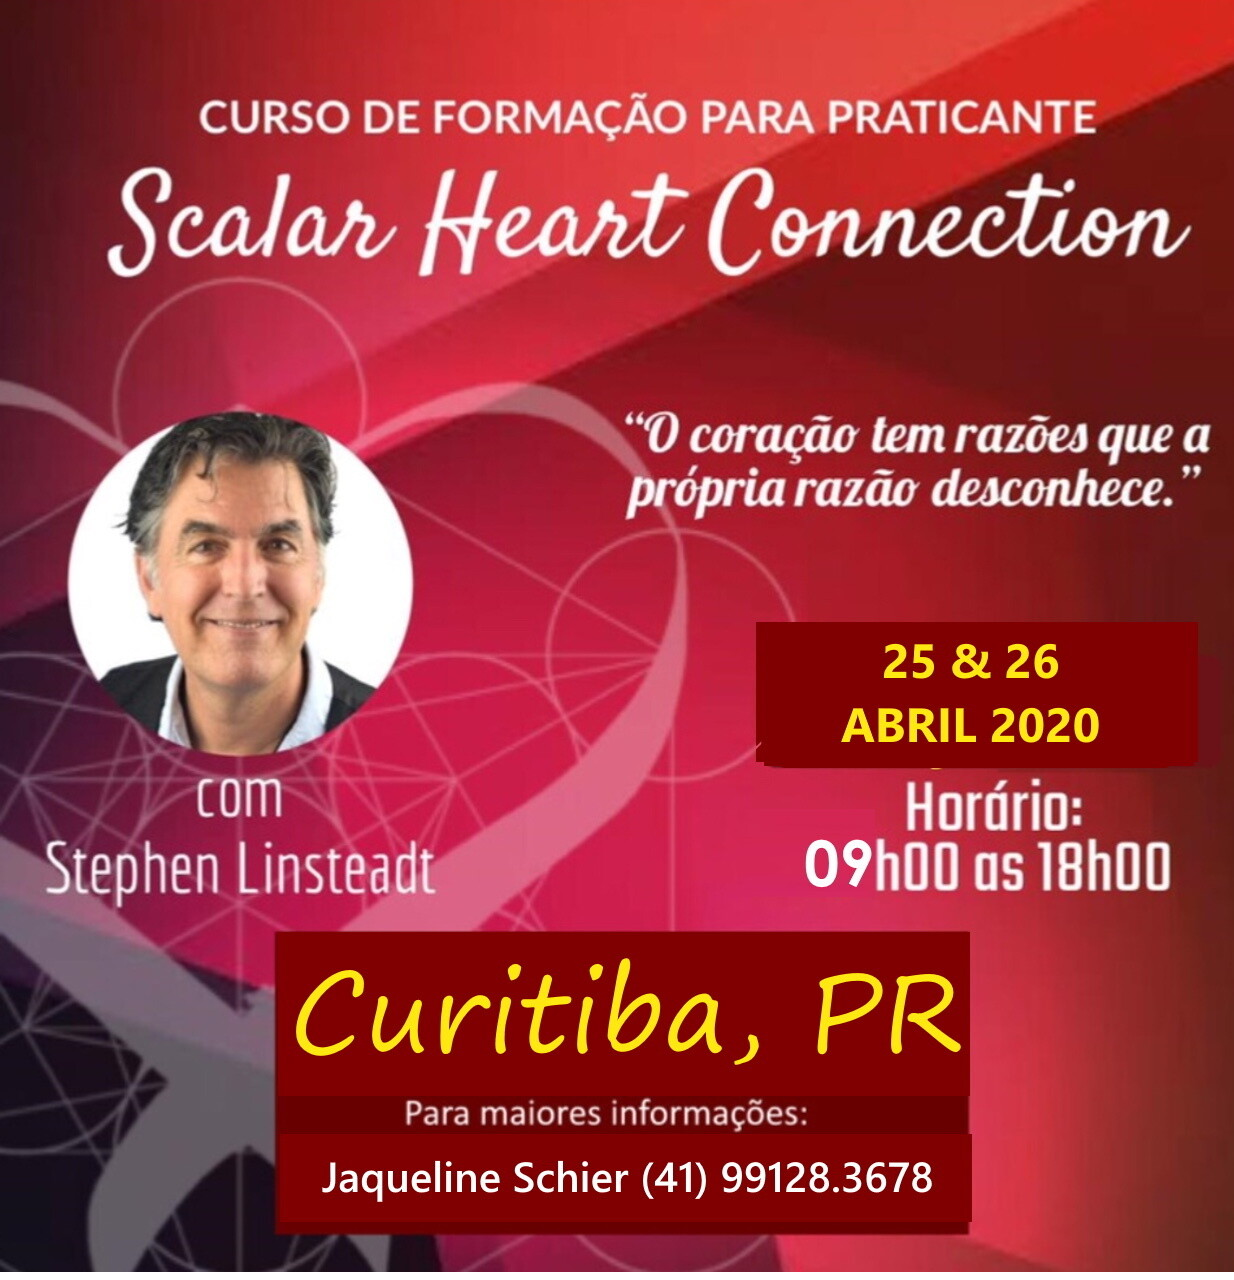 Curso de Formação de Praticante de Scalar Heart Connection - 25 & 26 de ABRIL de 2020 Curitiba, PR